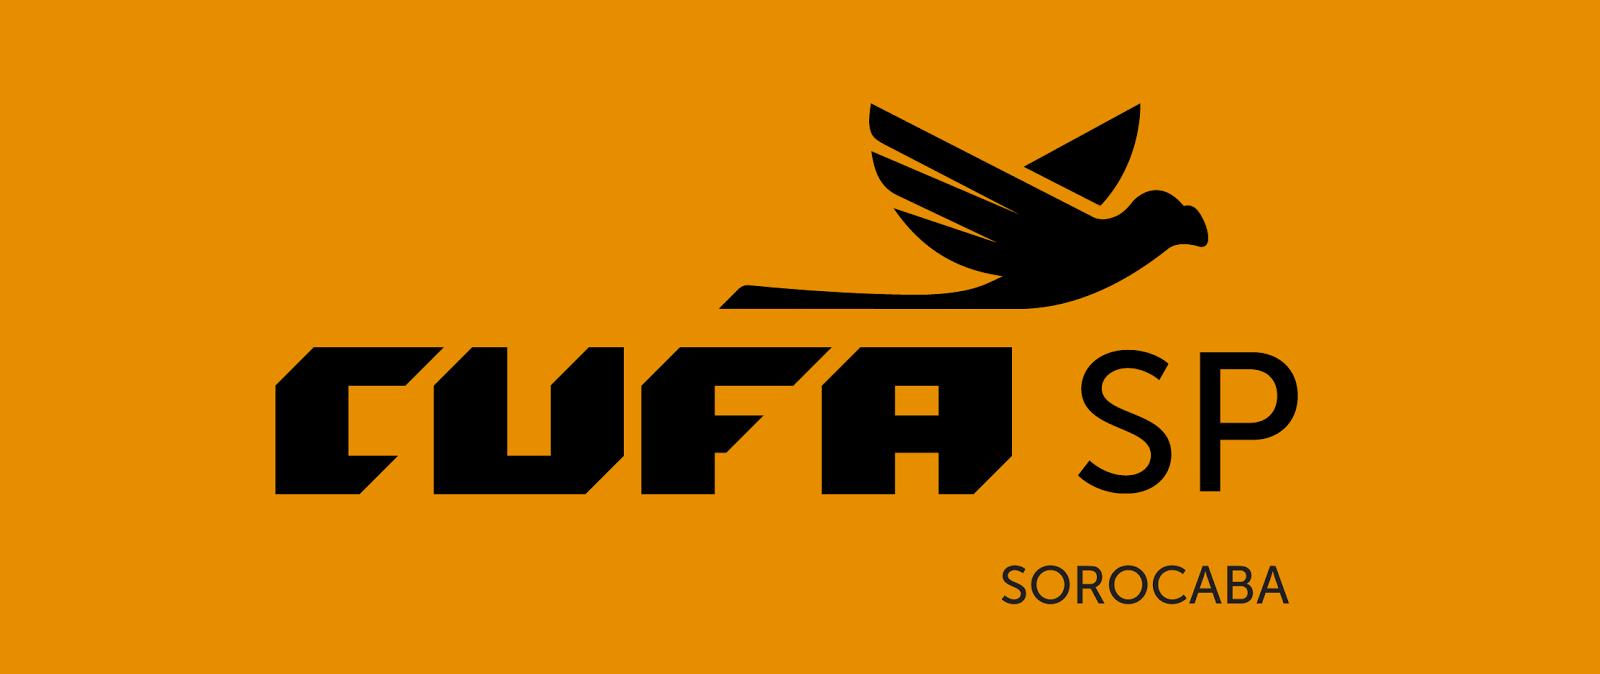 CUFA SOROCABA SP